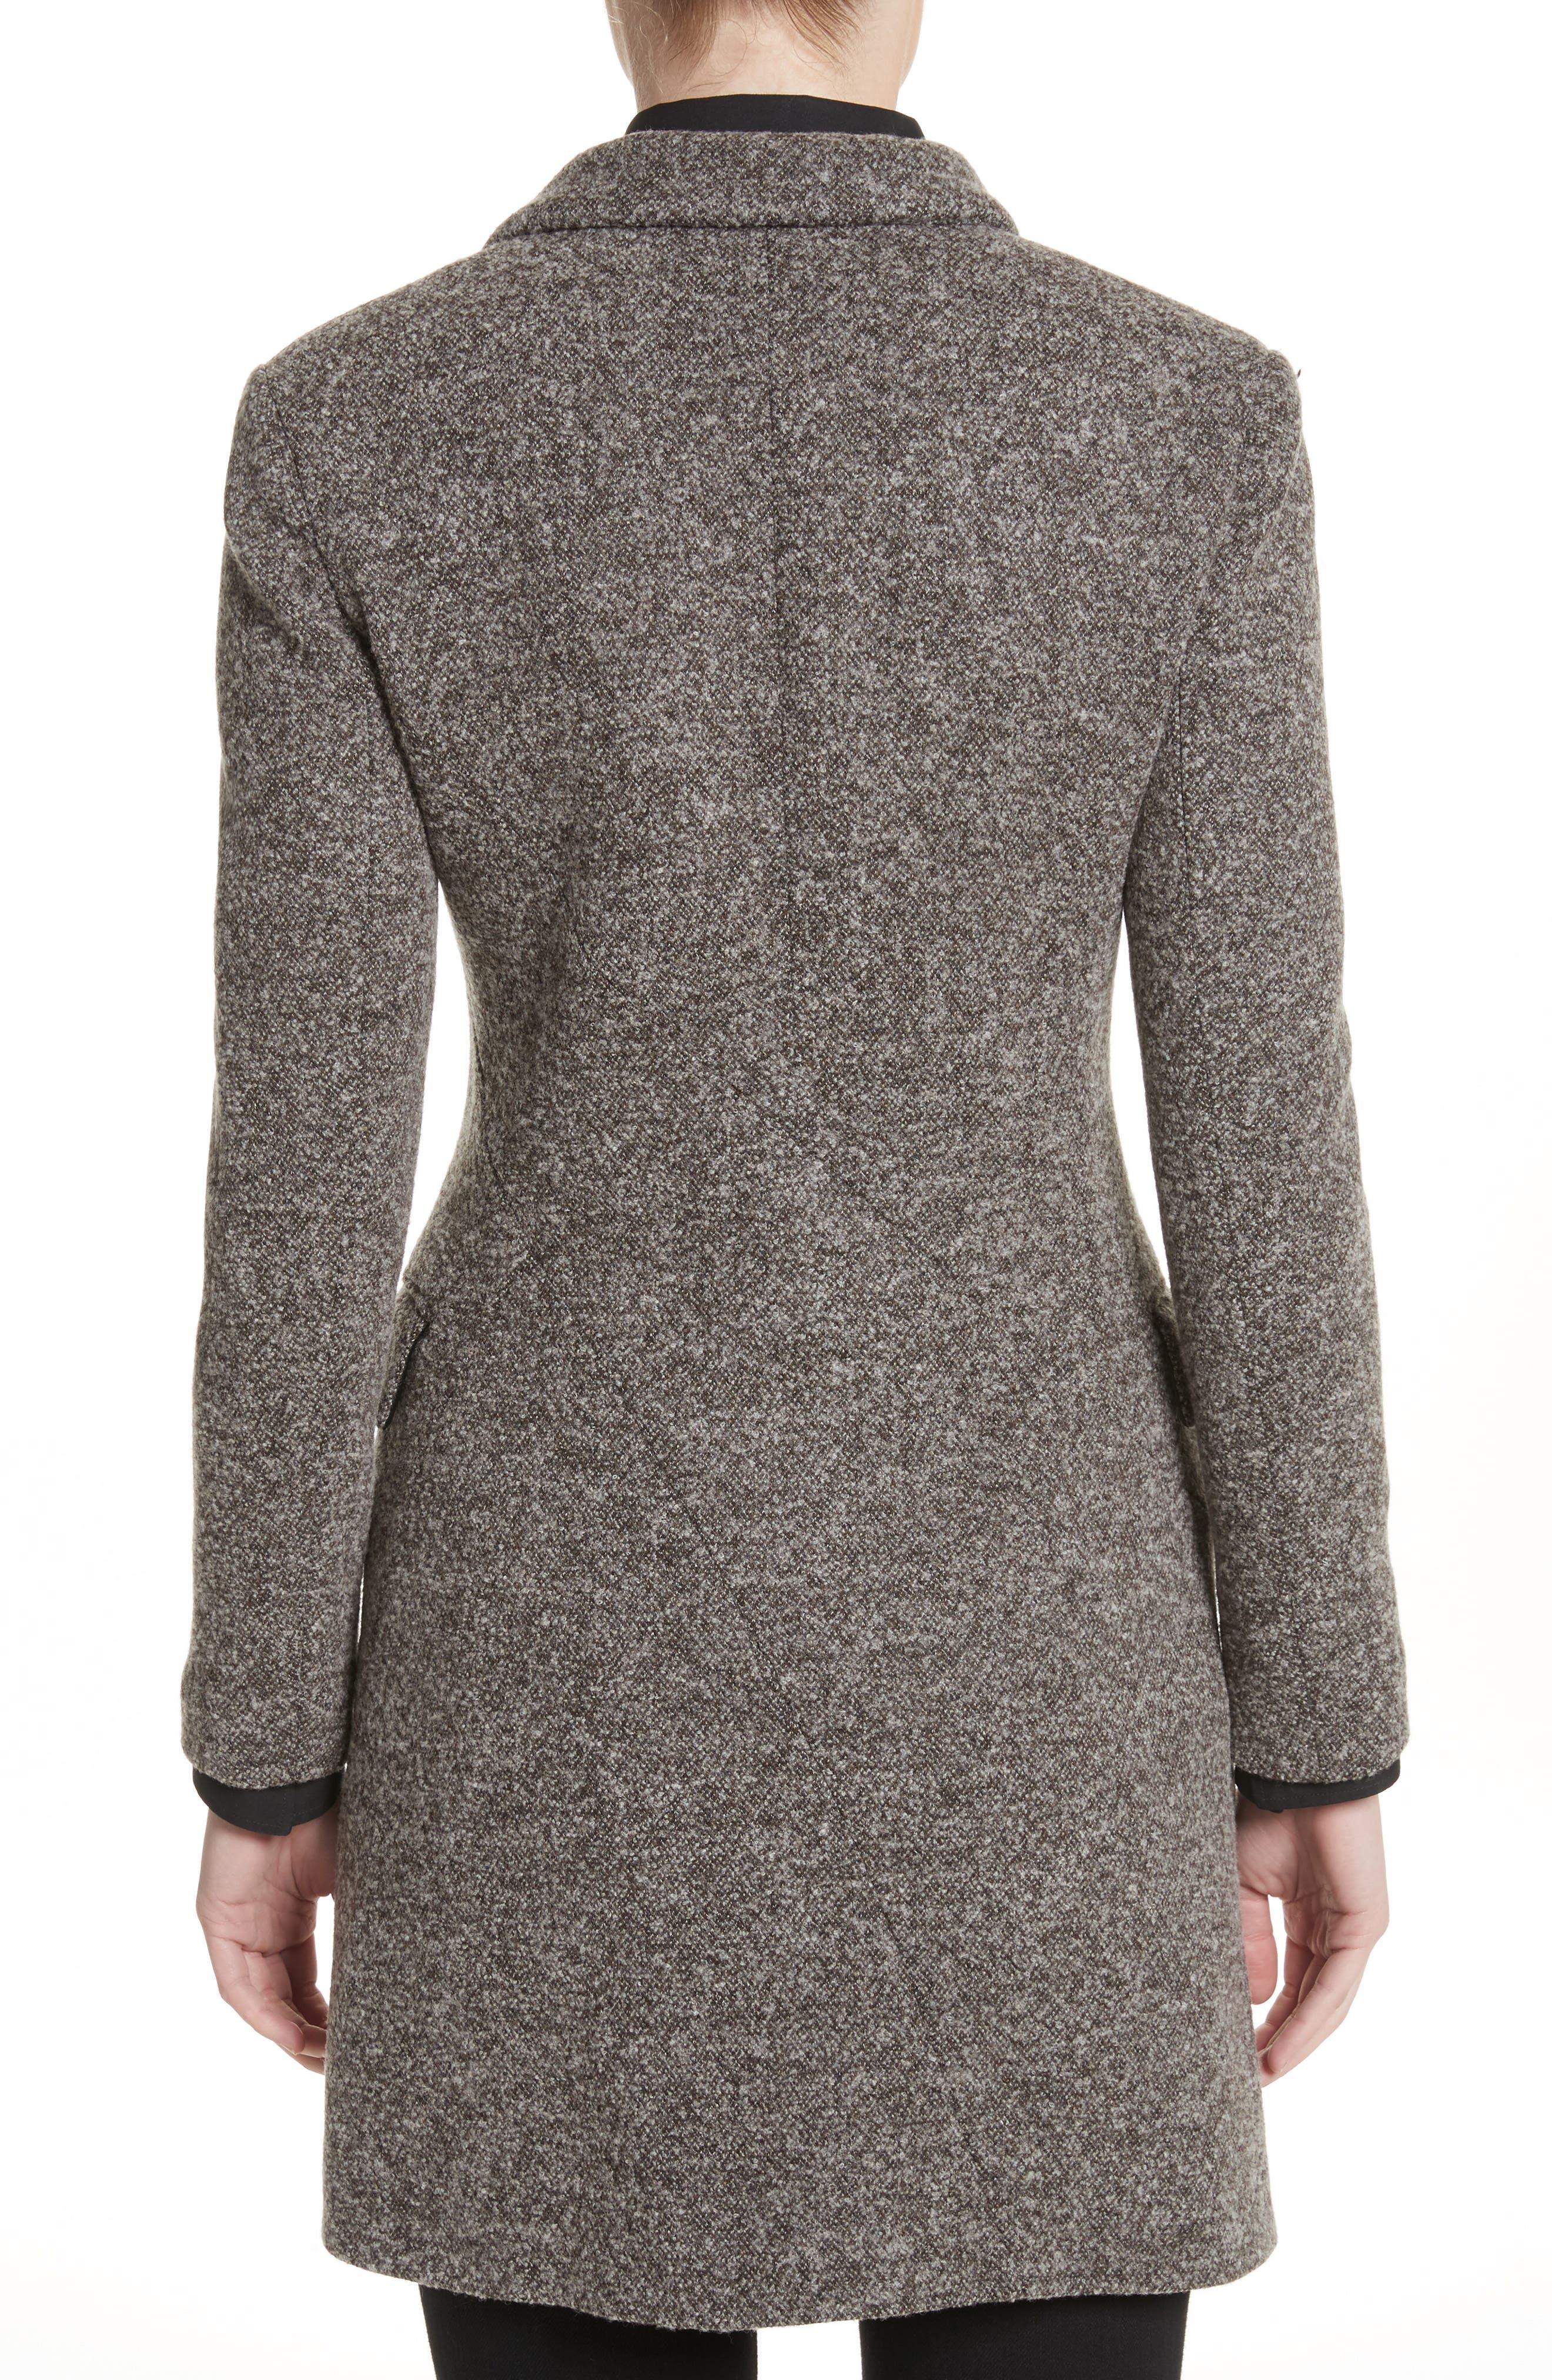 Jersey Galaxy Tweed Jacket,                             Alternate thumbnail 2, color,                             Grey